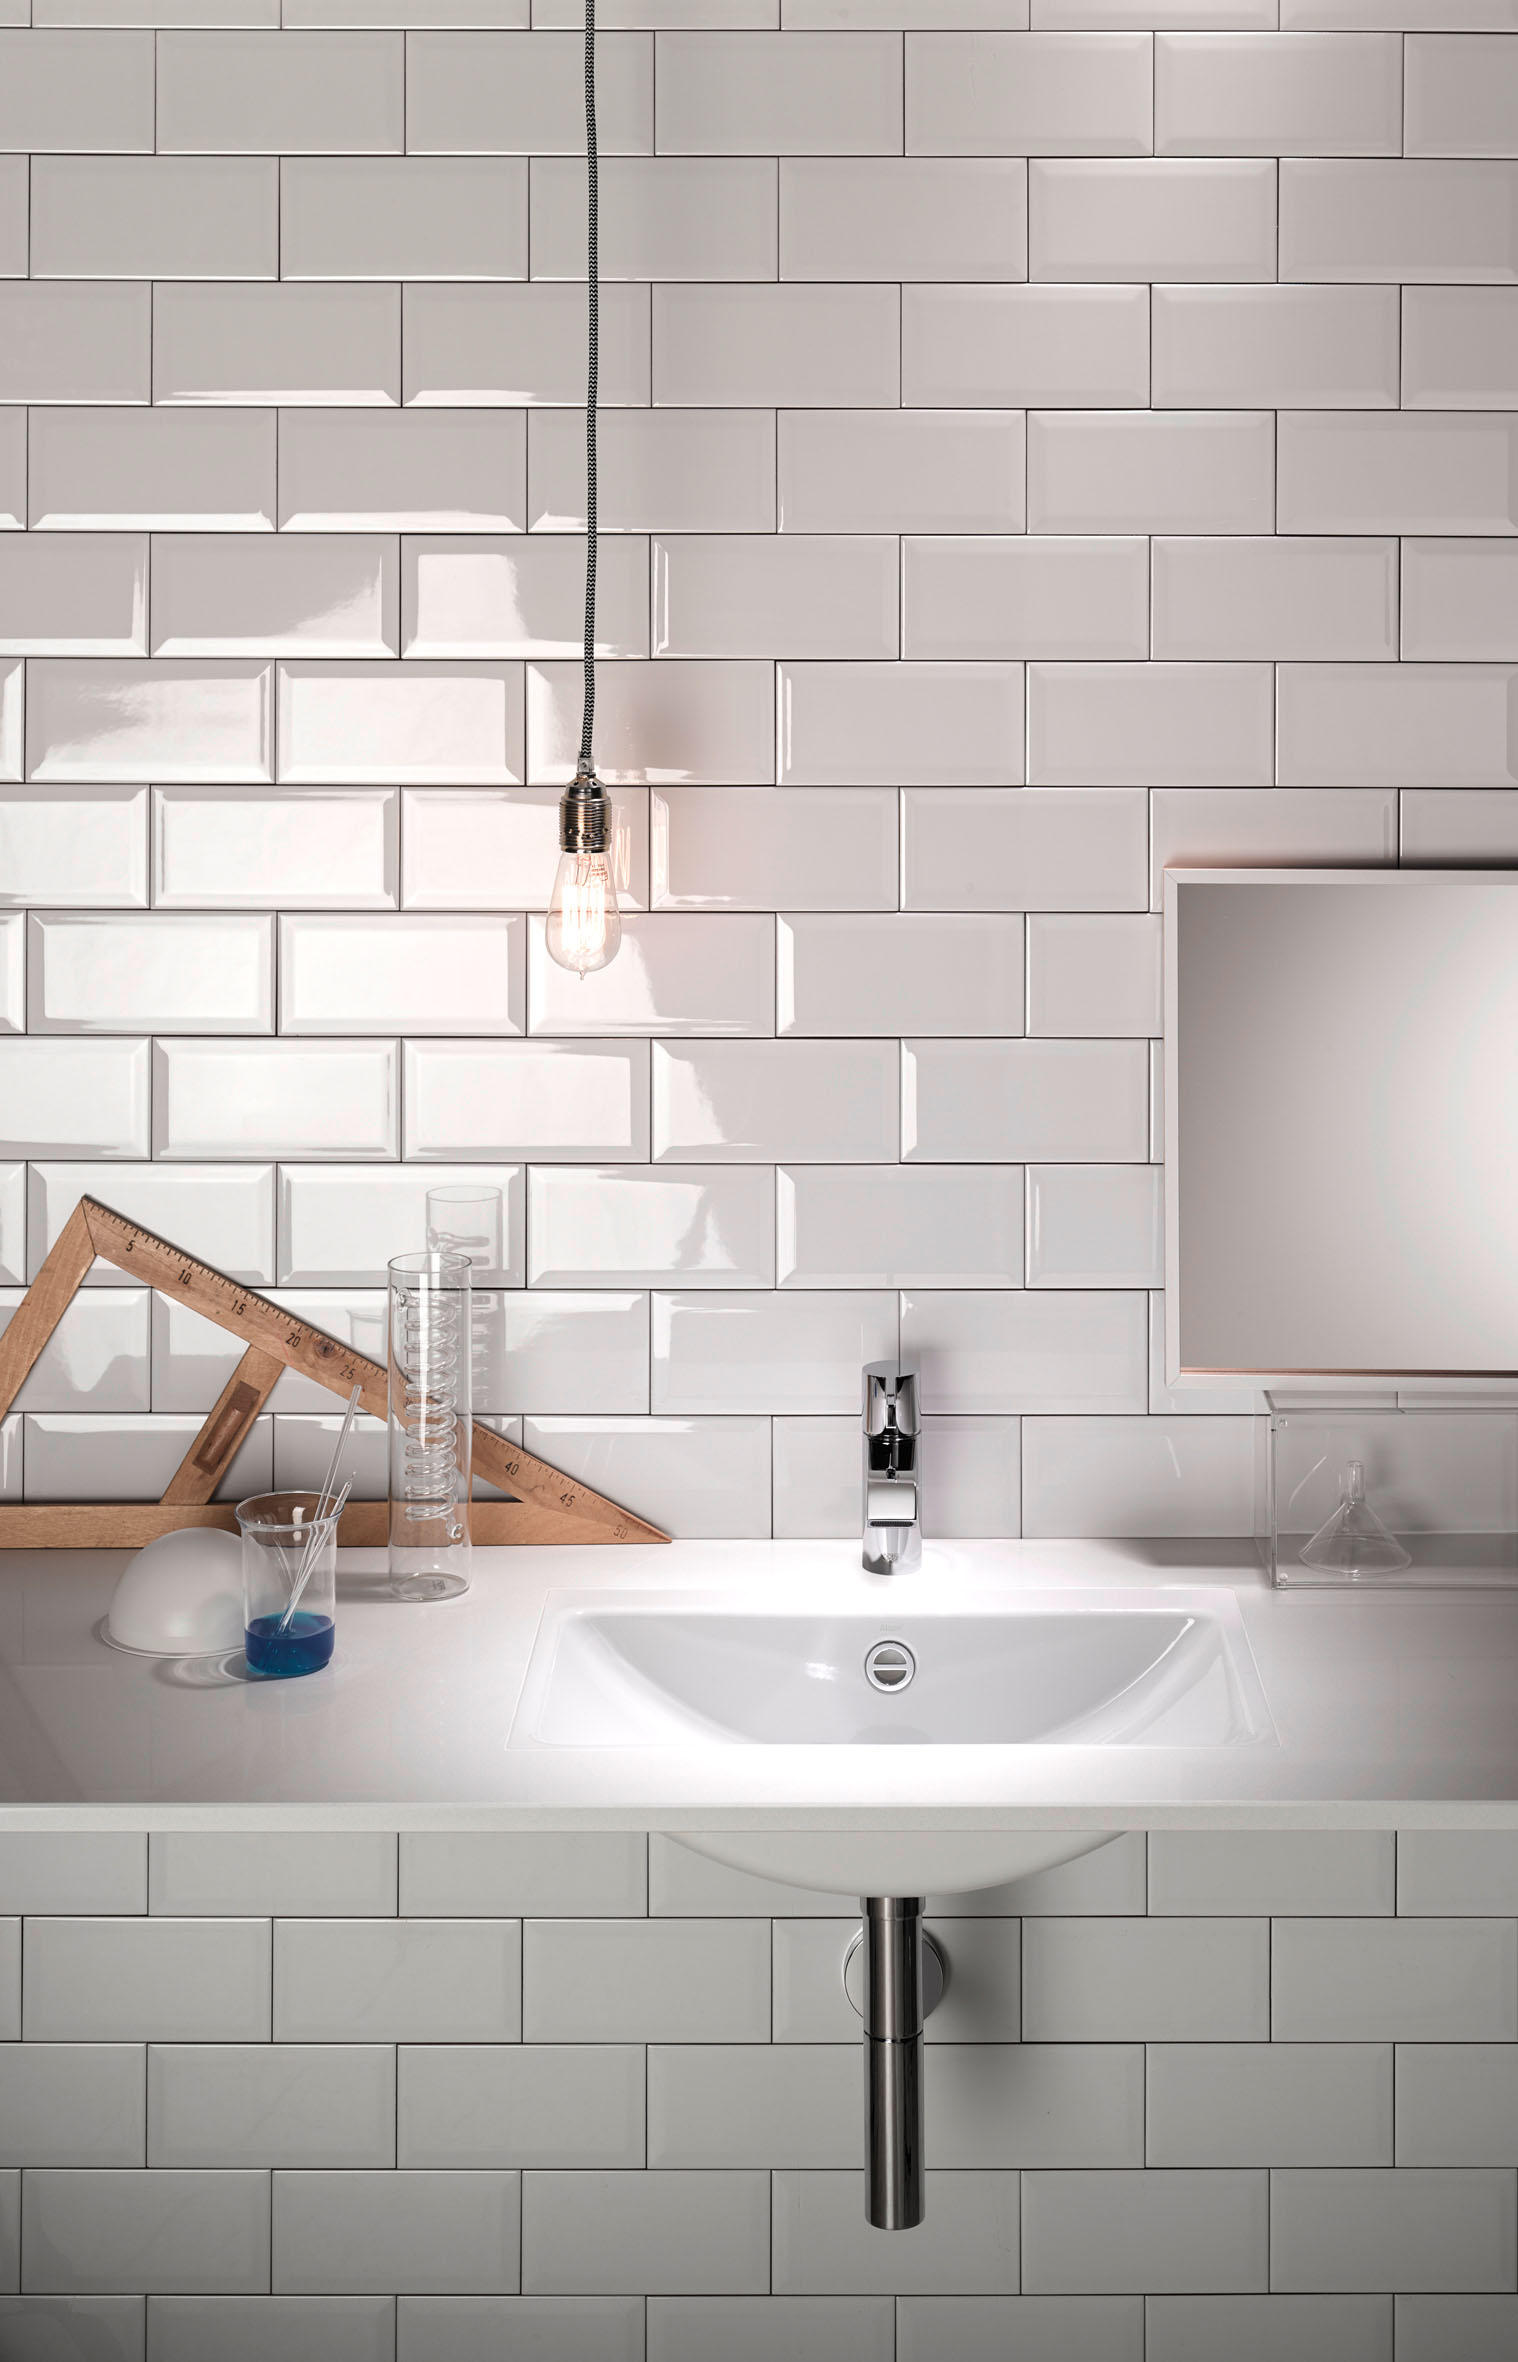 fb r800 3 lavabos de alape architonic. Black Bedroom Furniture Sets. Home Design Ideas